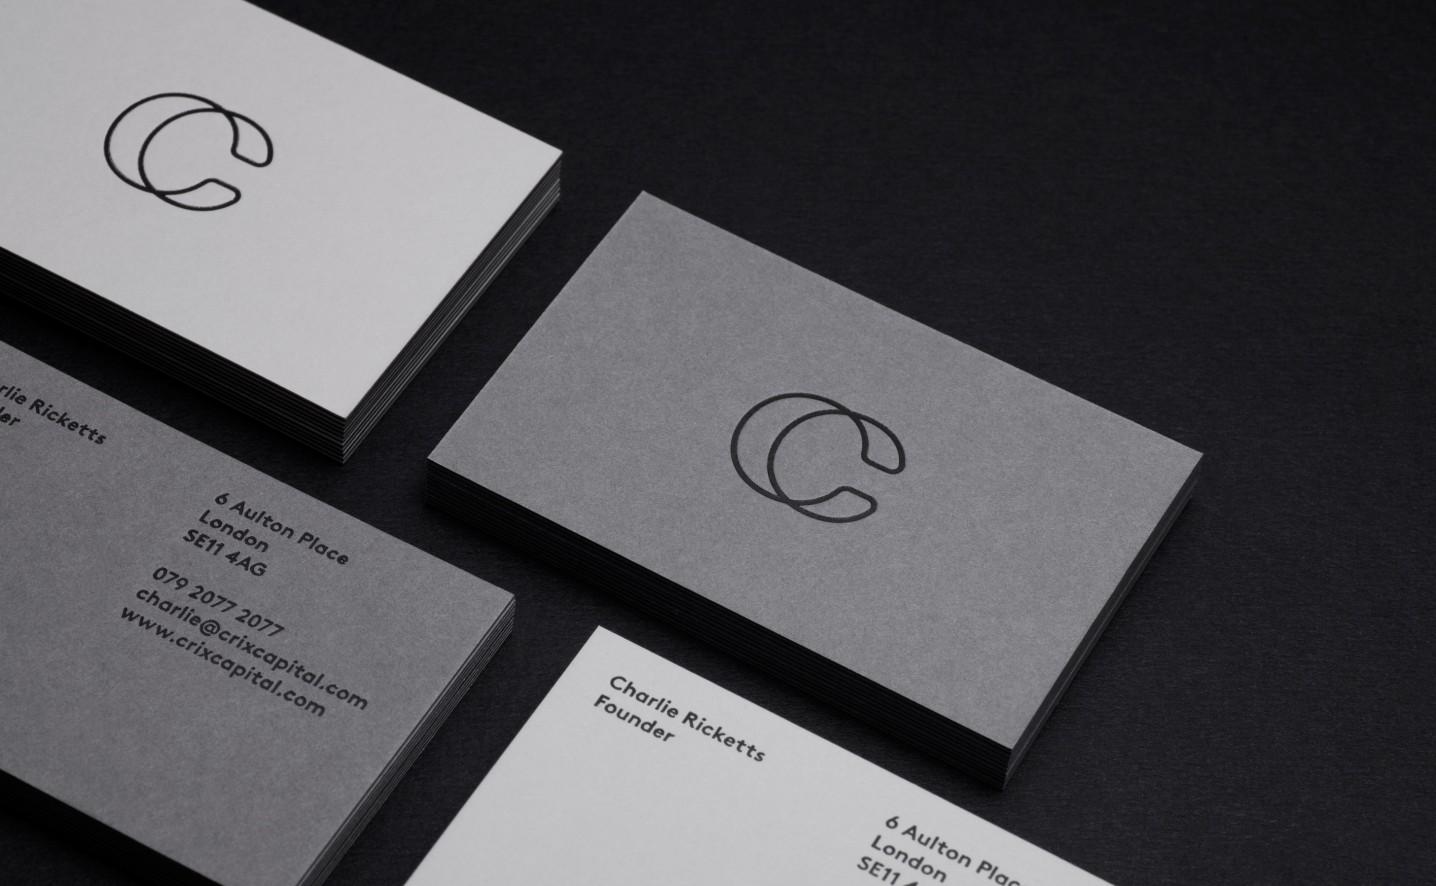 Business-card-design-crix-capital-london-03